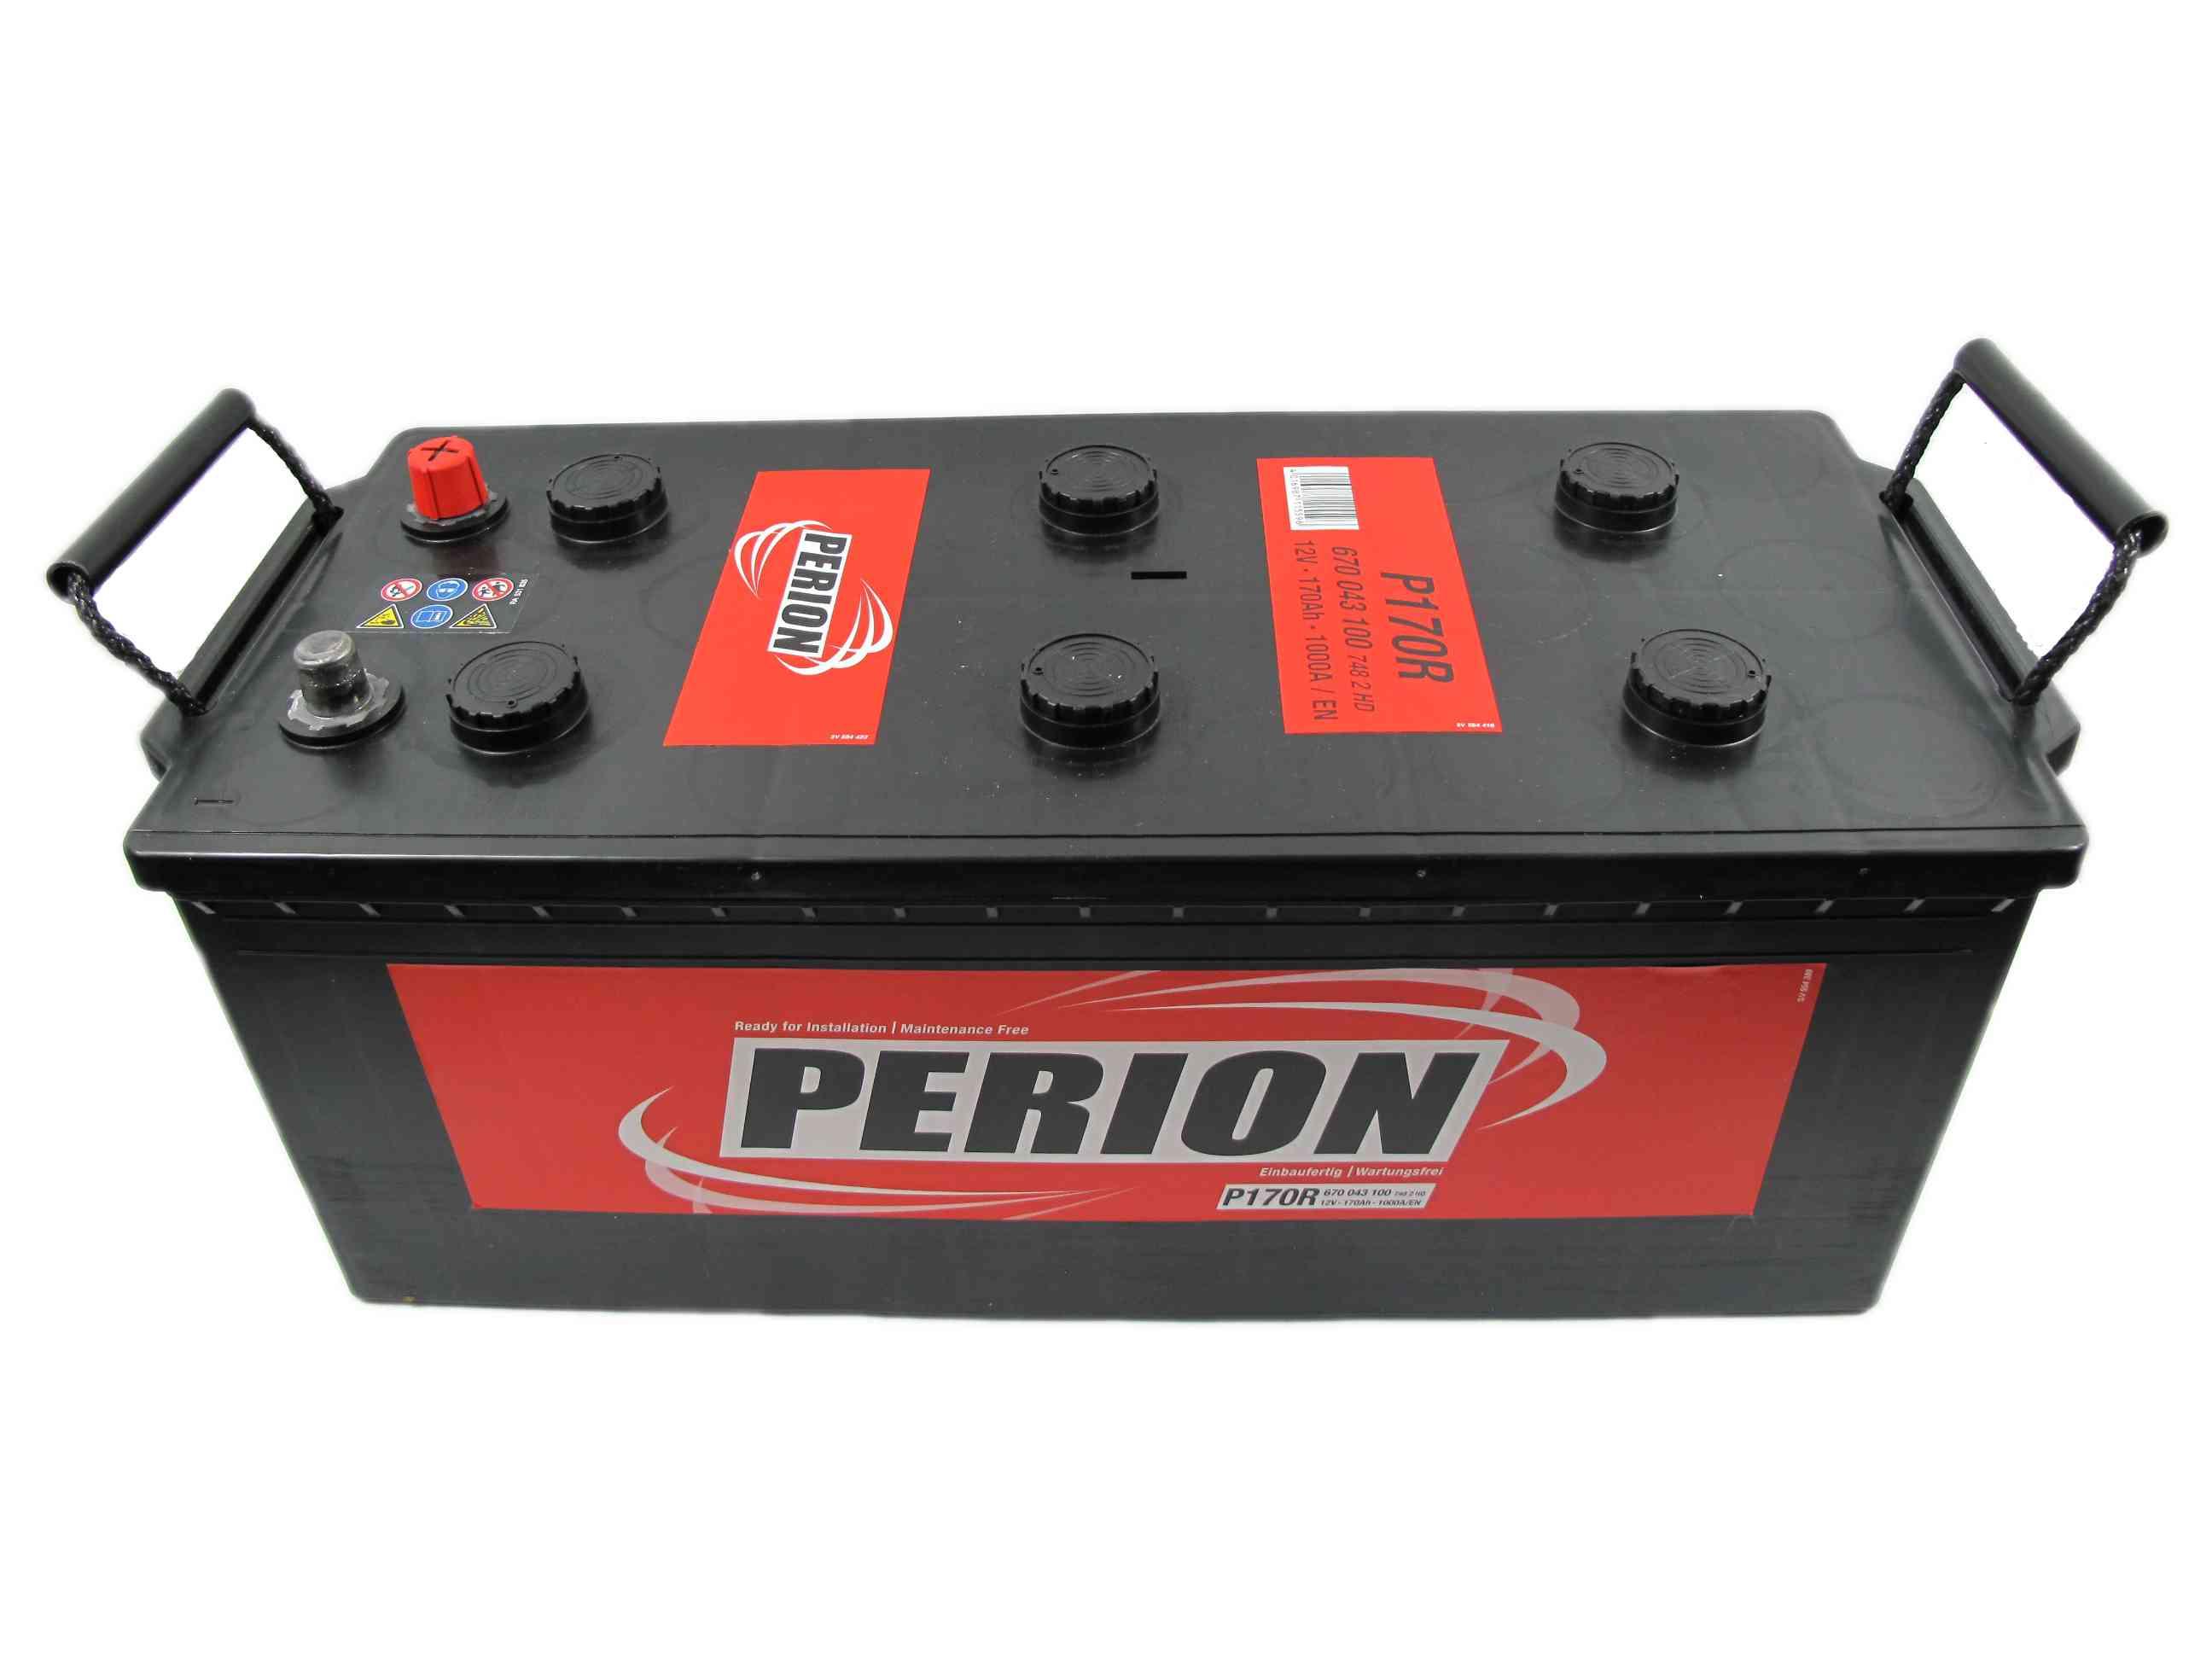 PERION Perion - 12v 170ah - teherautó akkumulátor